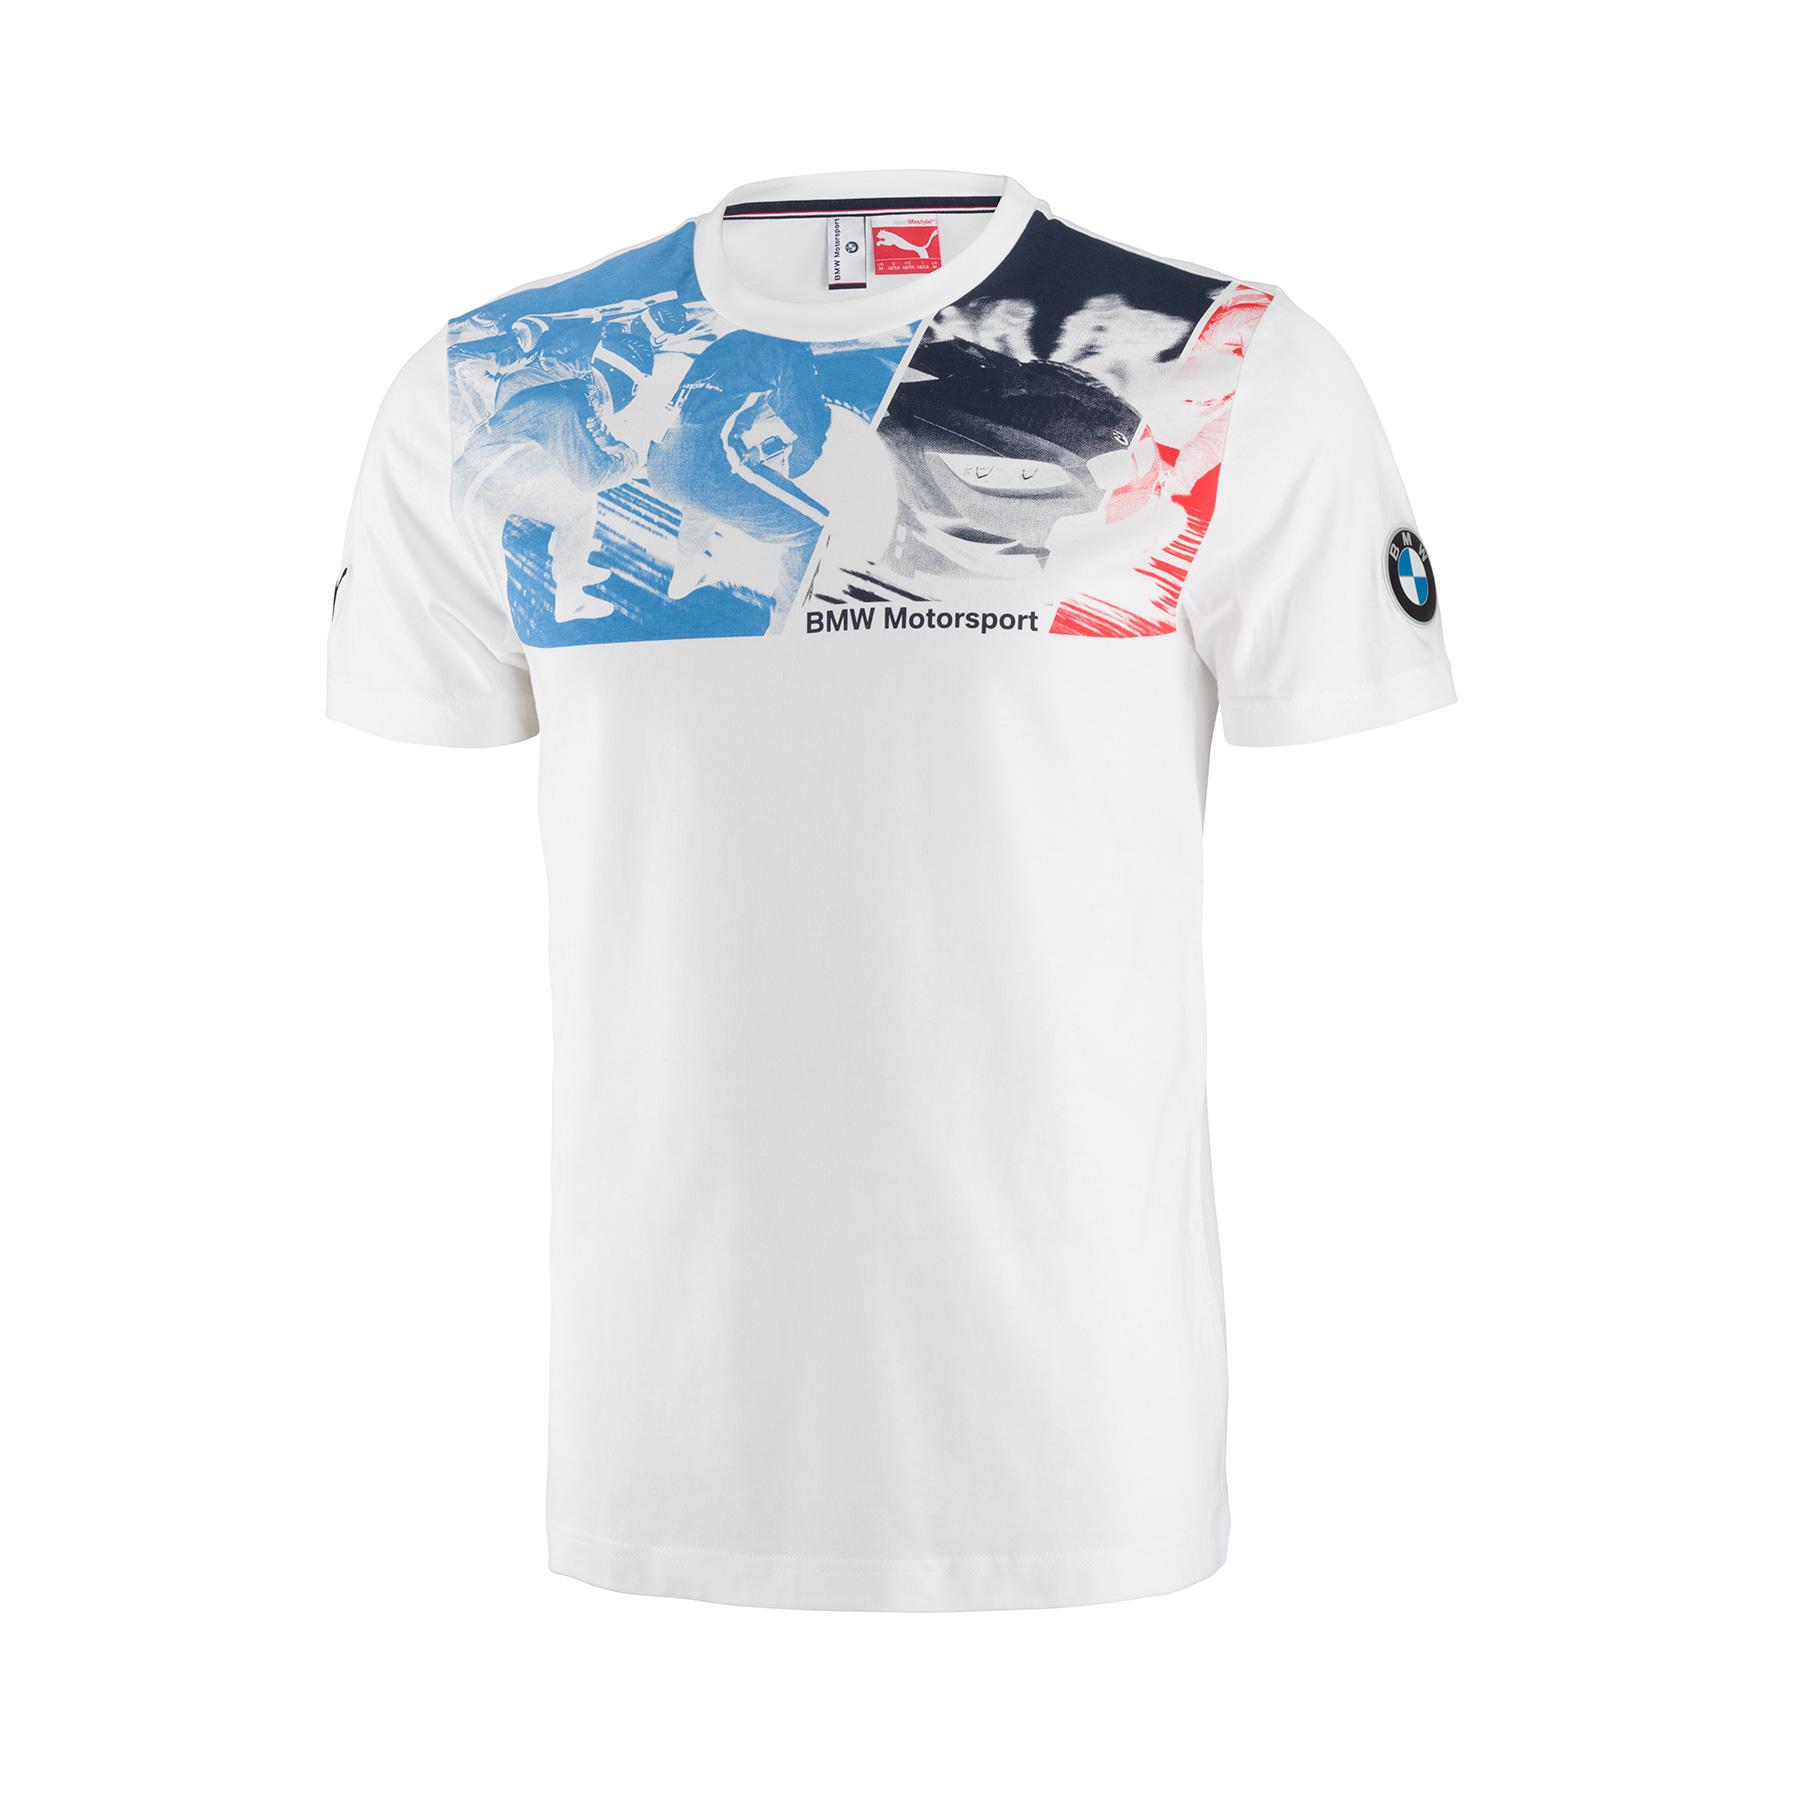 new puma bmw motorsport m3 m5 m sport graphic t shirt. Black Bedroom Furniture Sets. Home Design Ideas